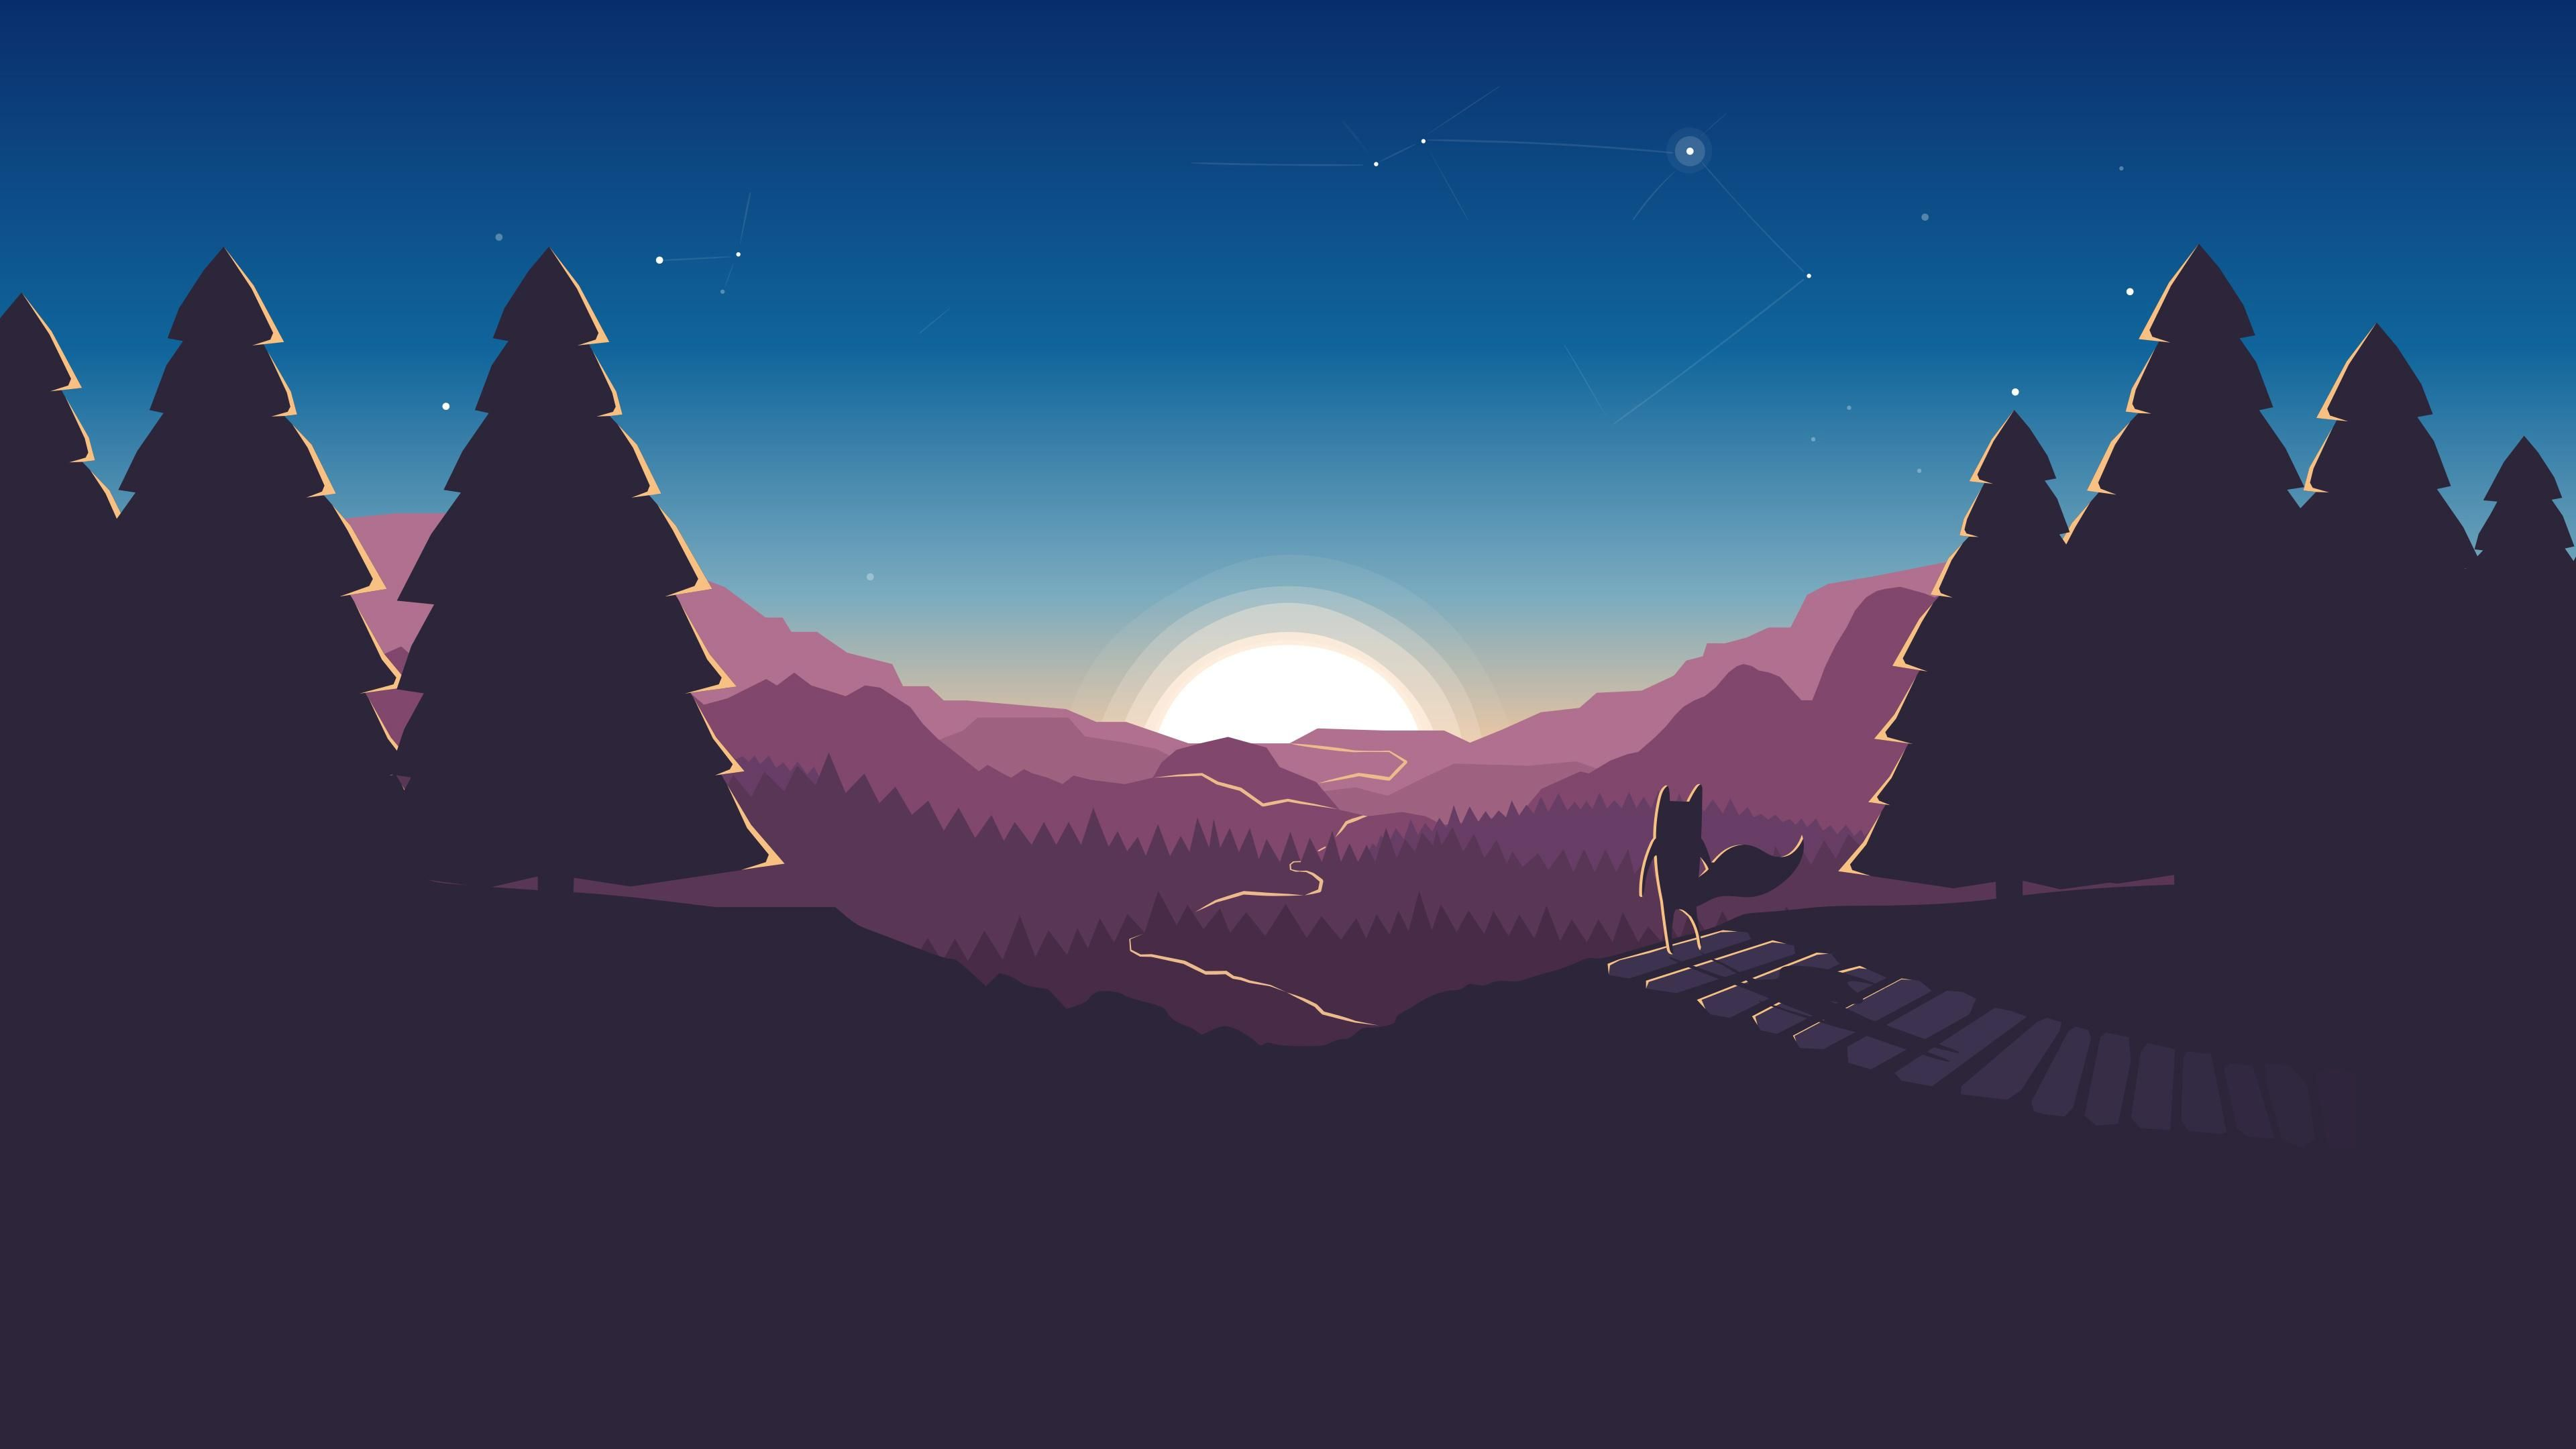 Flat Design Illustration 3840x2160 Music Indieartist